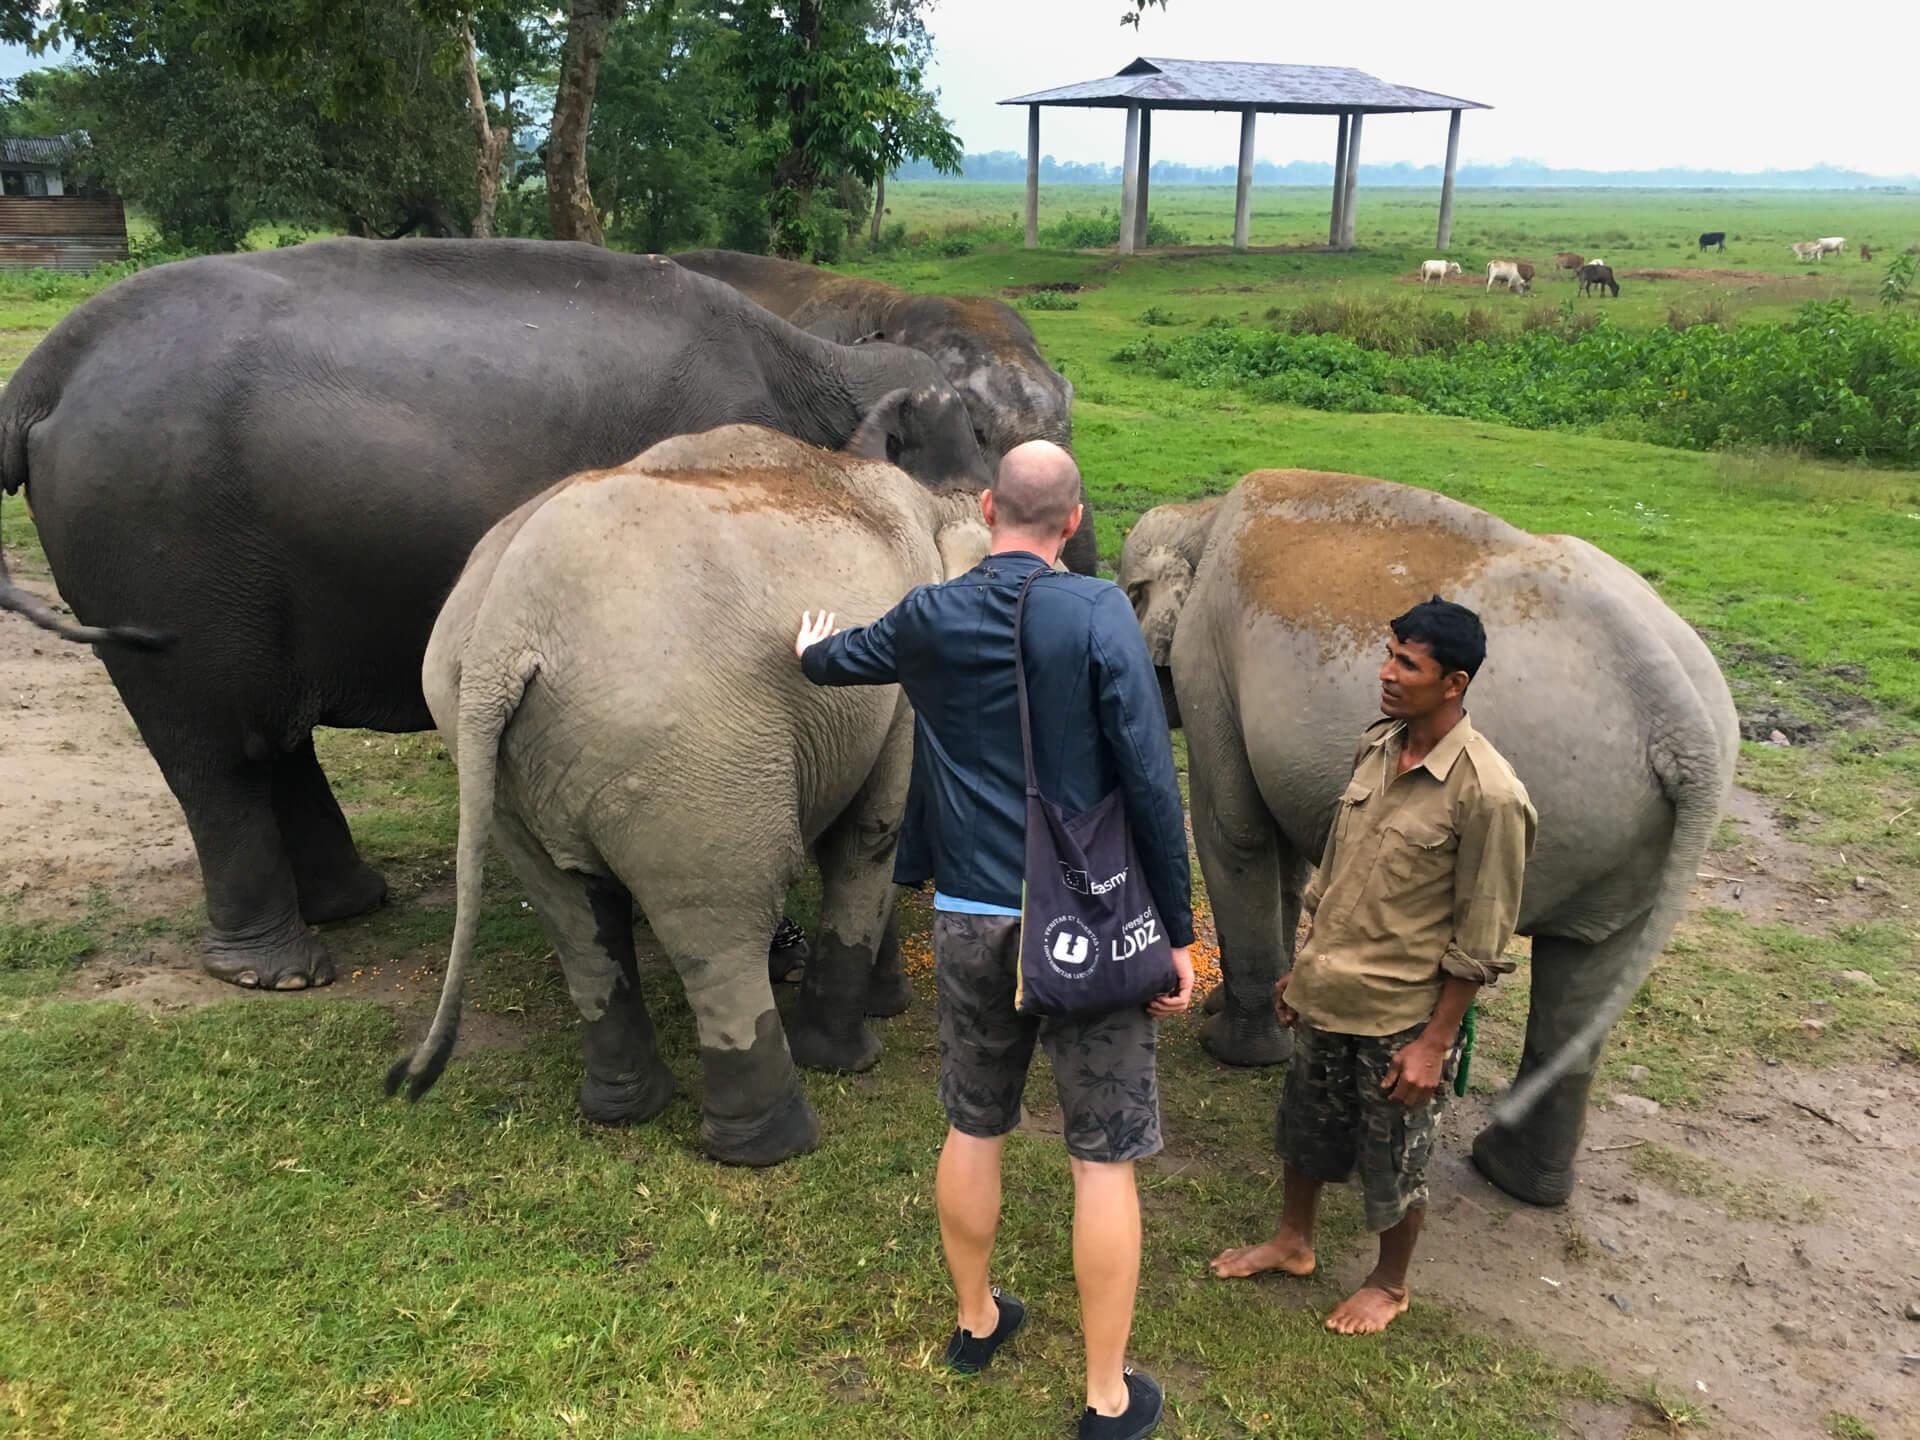 Me patting one of three elephants that are feeding.